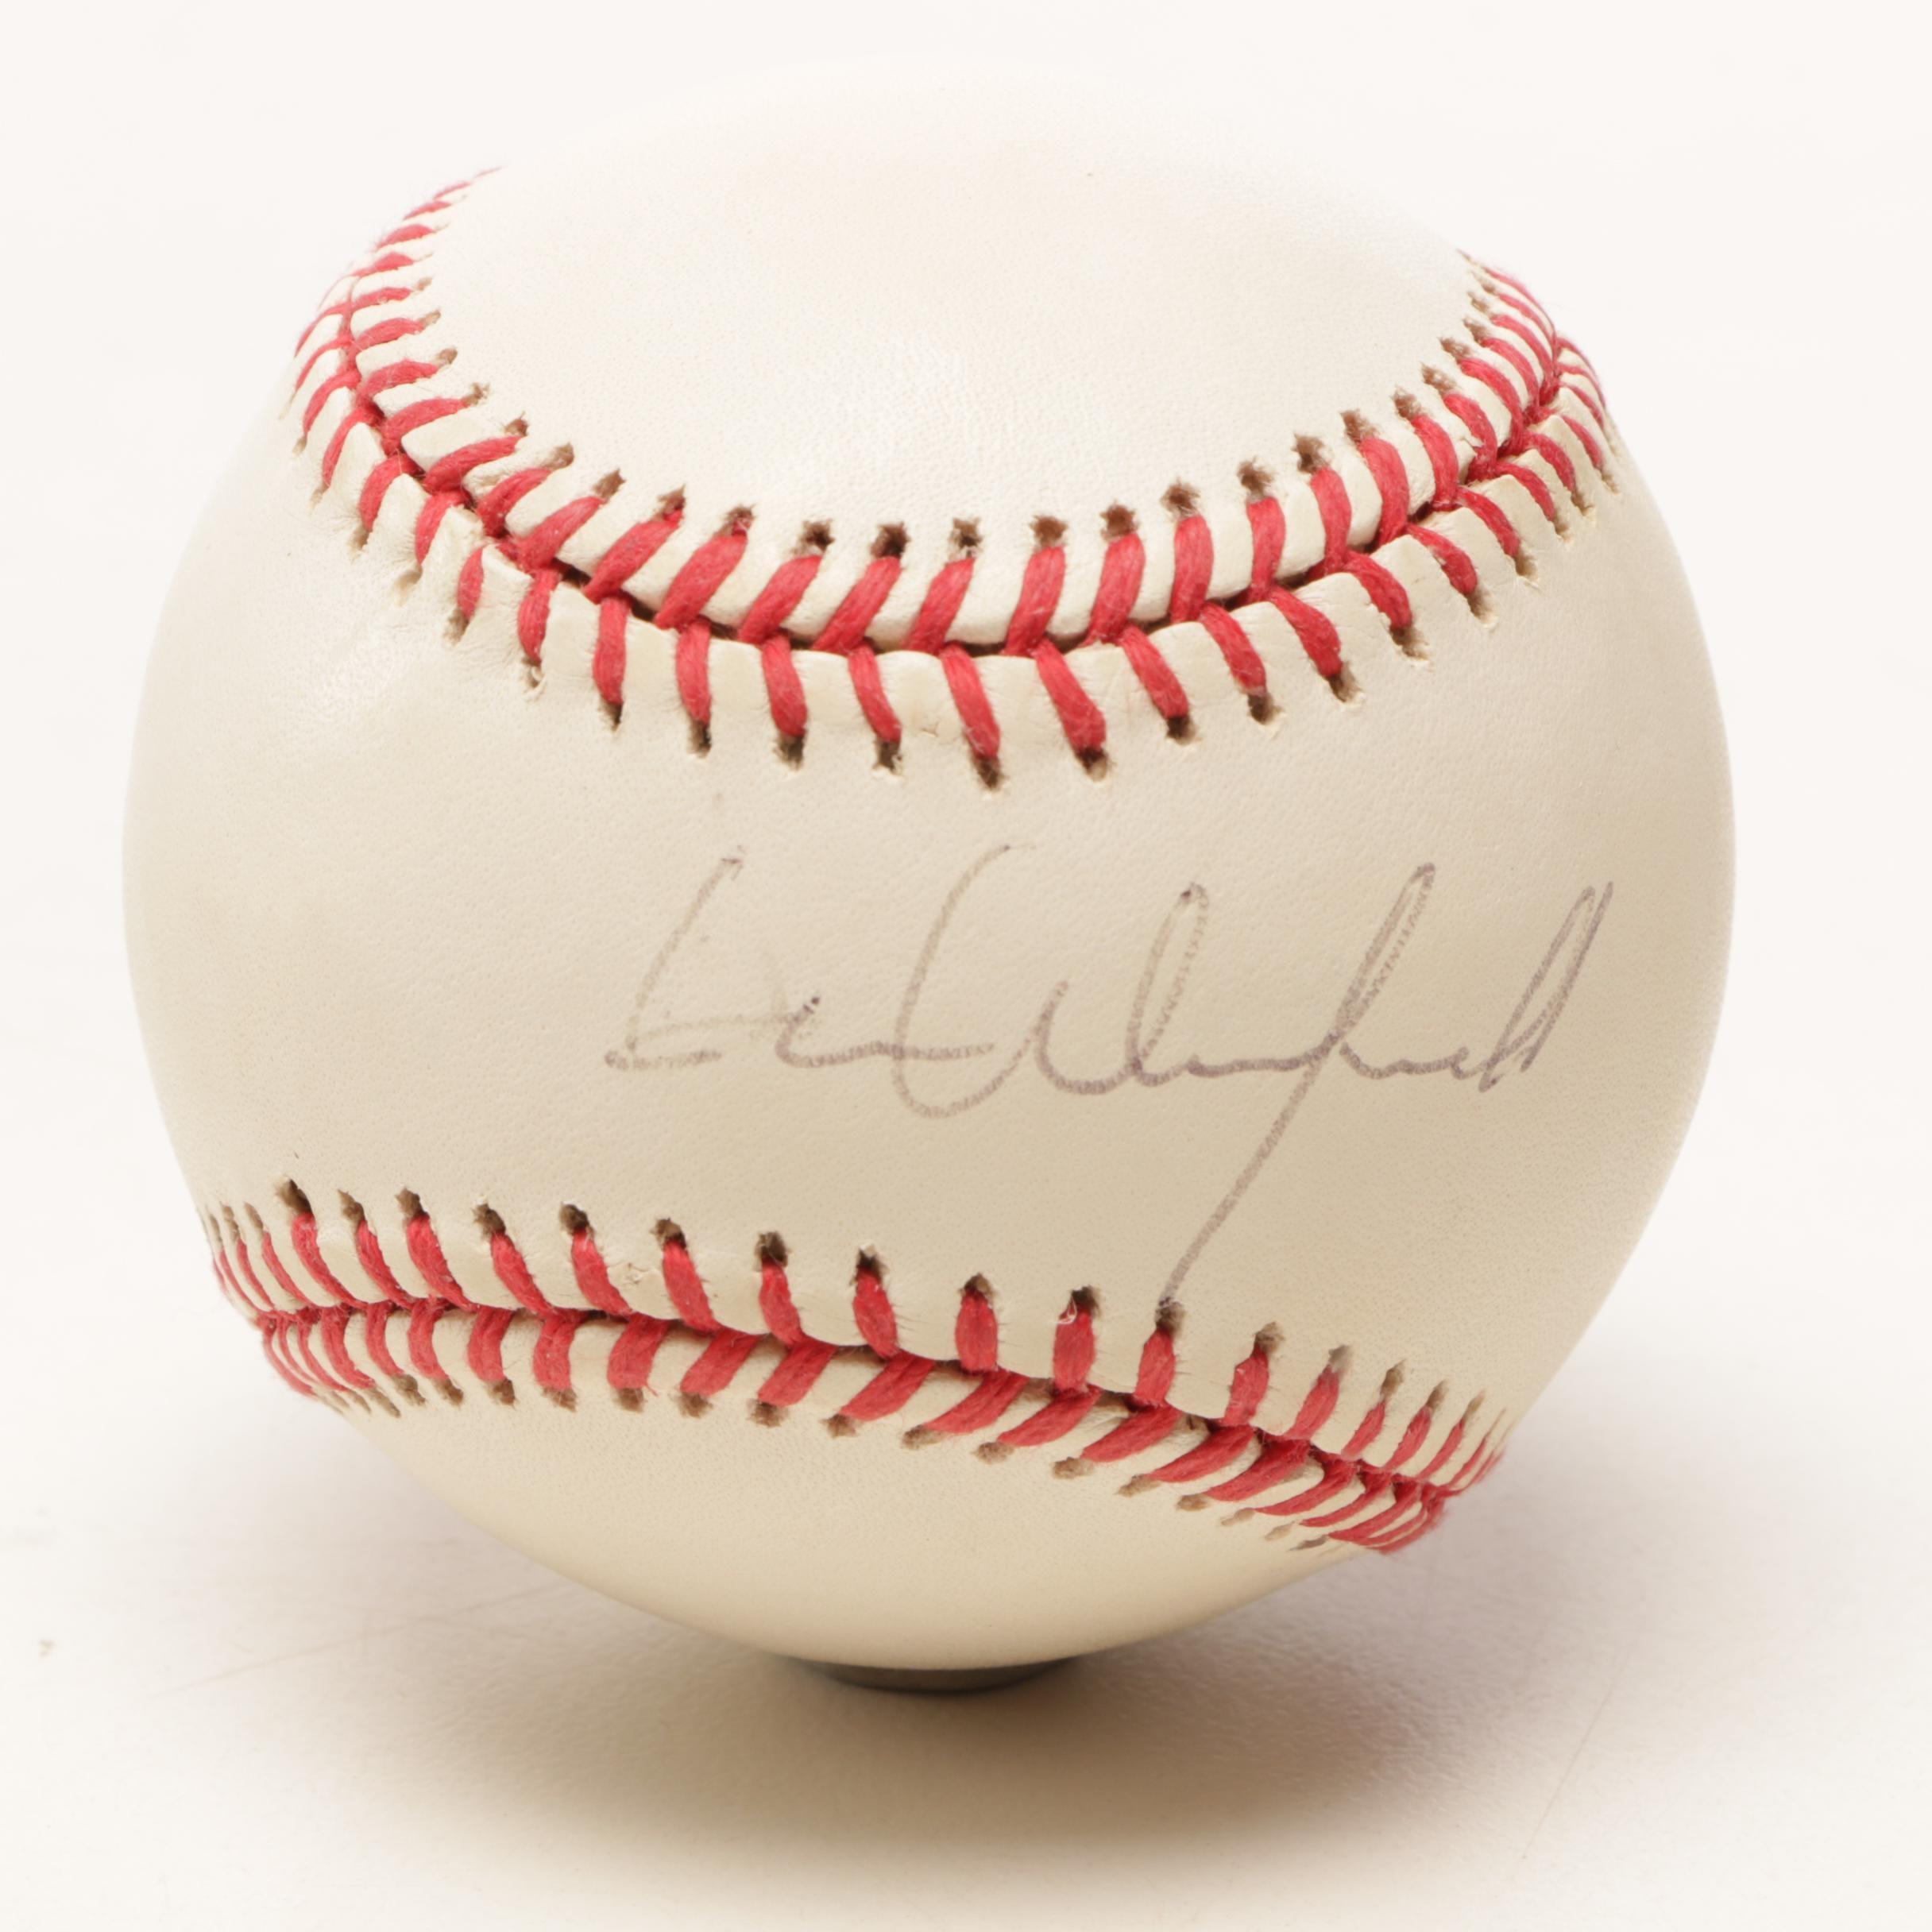 (HOF) Dave Winfield Signed Rawlings American League Baseball